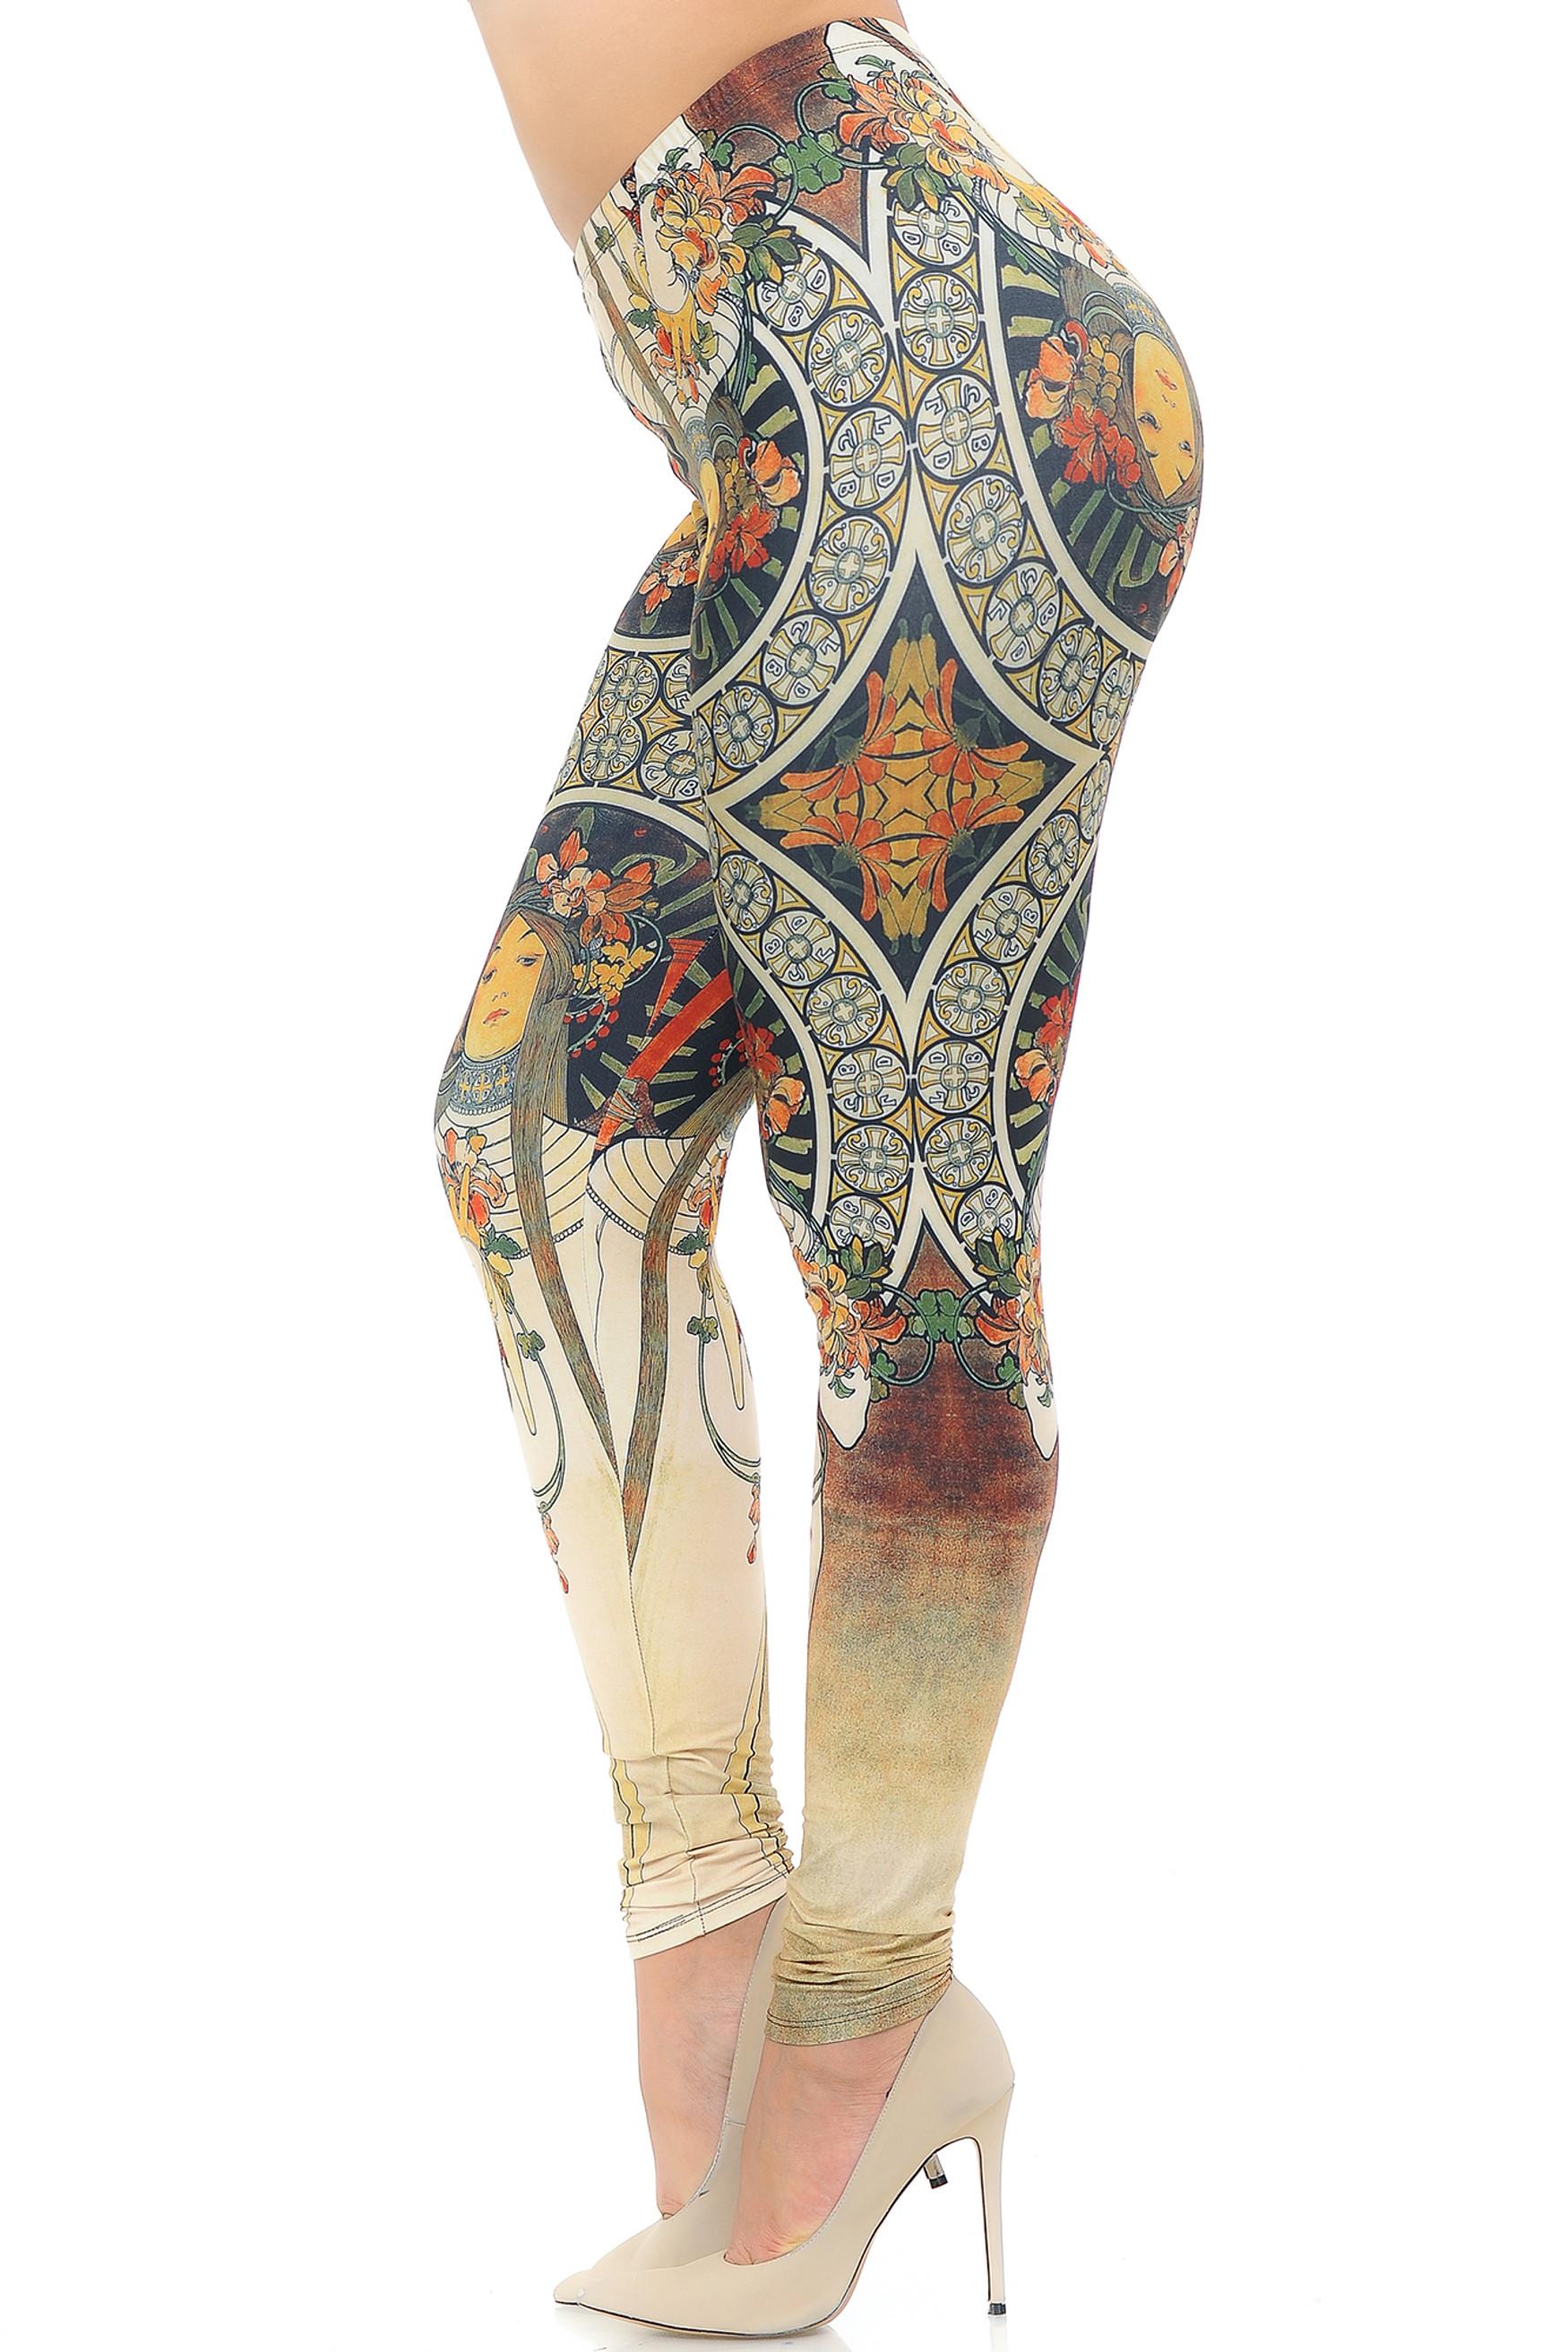 Creamy Soft Gaia Mucha Extra Plus Size Leggings - 3X-5X - USA Fashion™